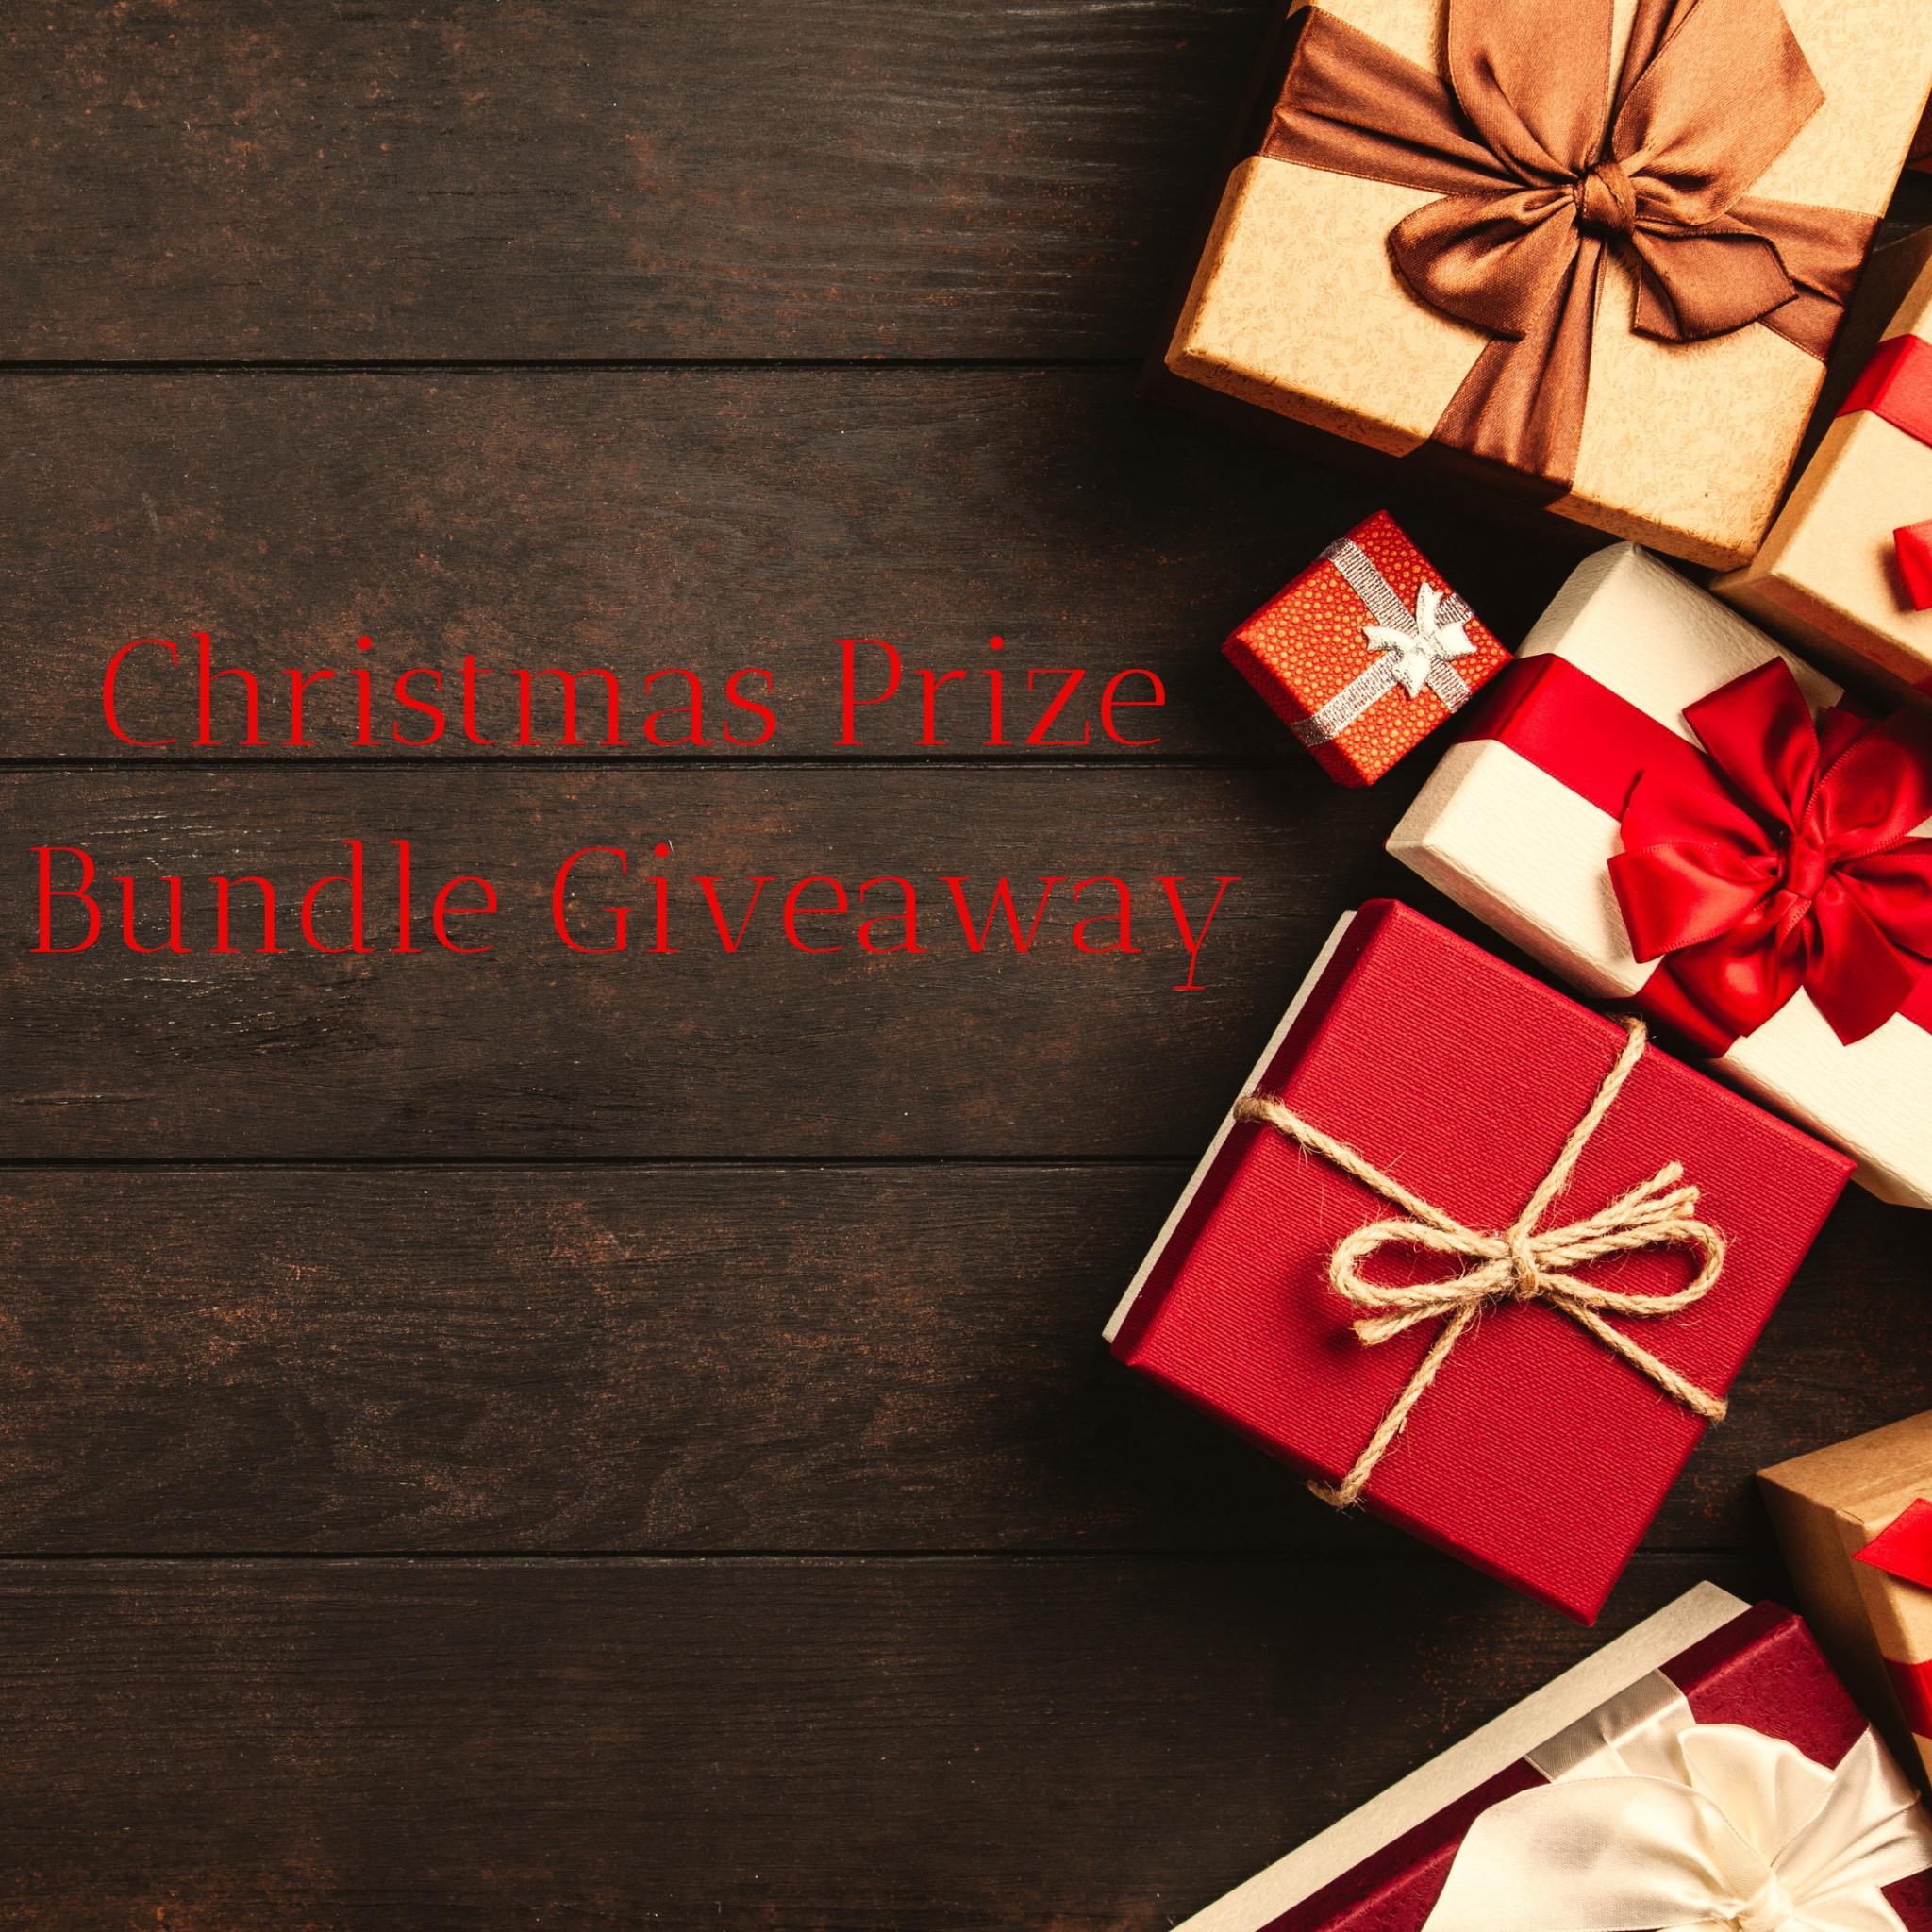 Christmas Prize Bundle Giveaway